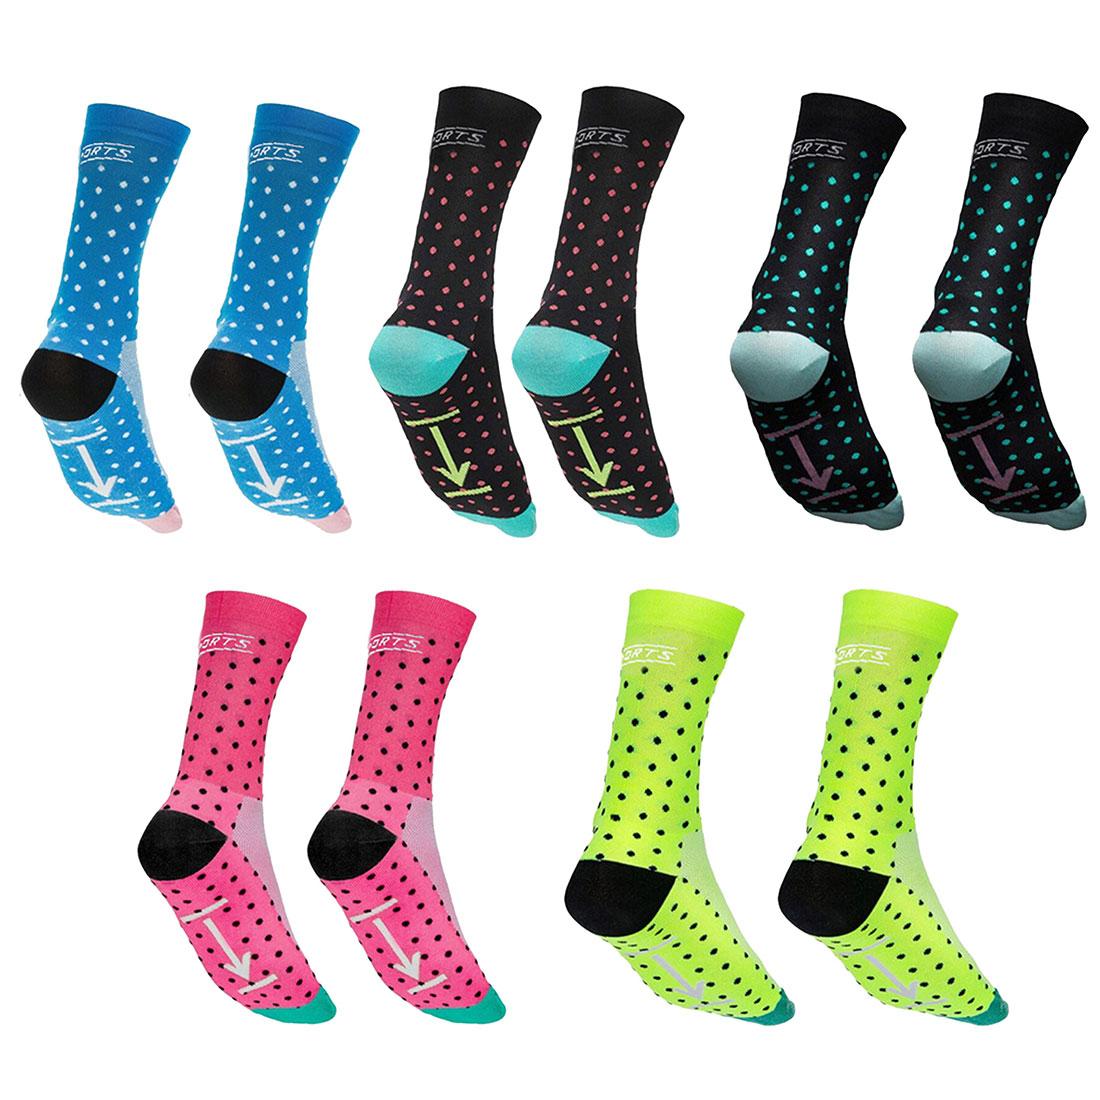 New Professional Brand Exercise Socks Breathable Road Bicycle Socks  Sports Long Breathable Sock